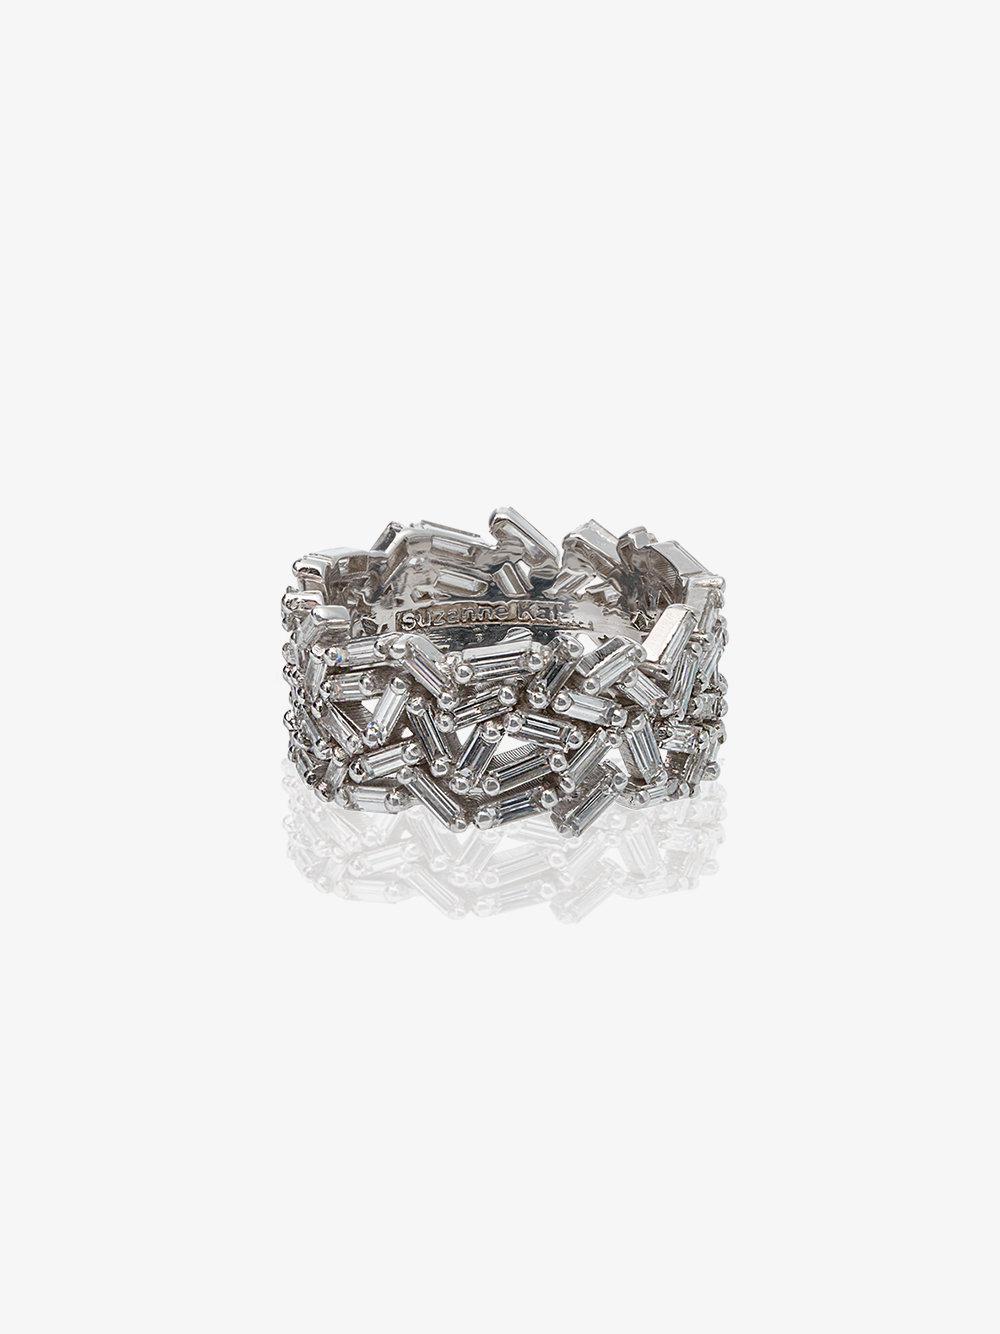 18K White Gold and diamond Medium Sparkler Eternity Band Suzanne Kalan 1aJAWbT